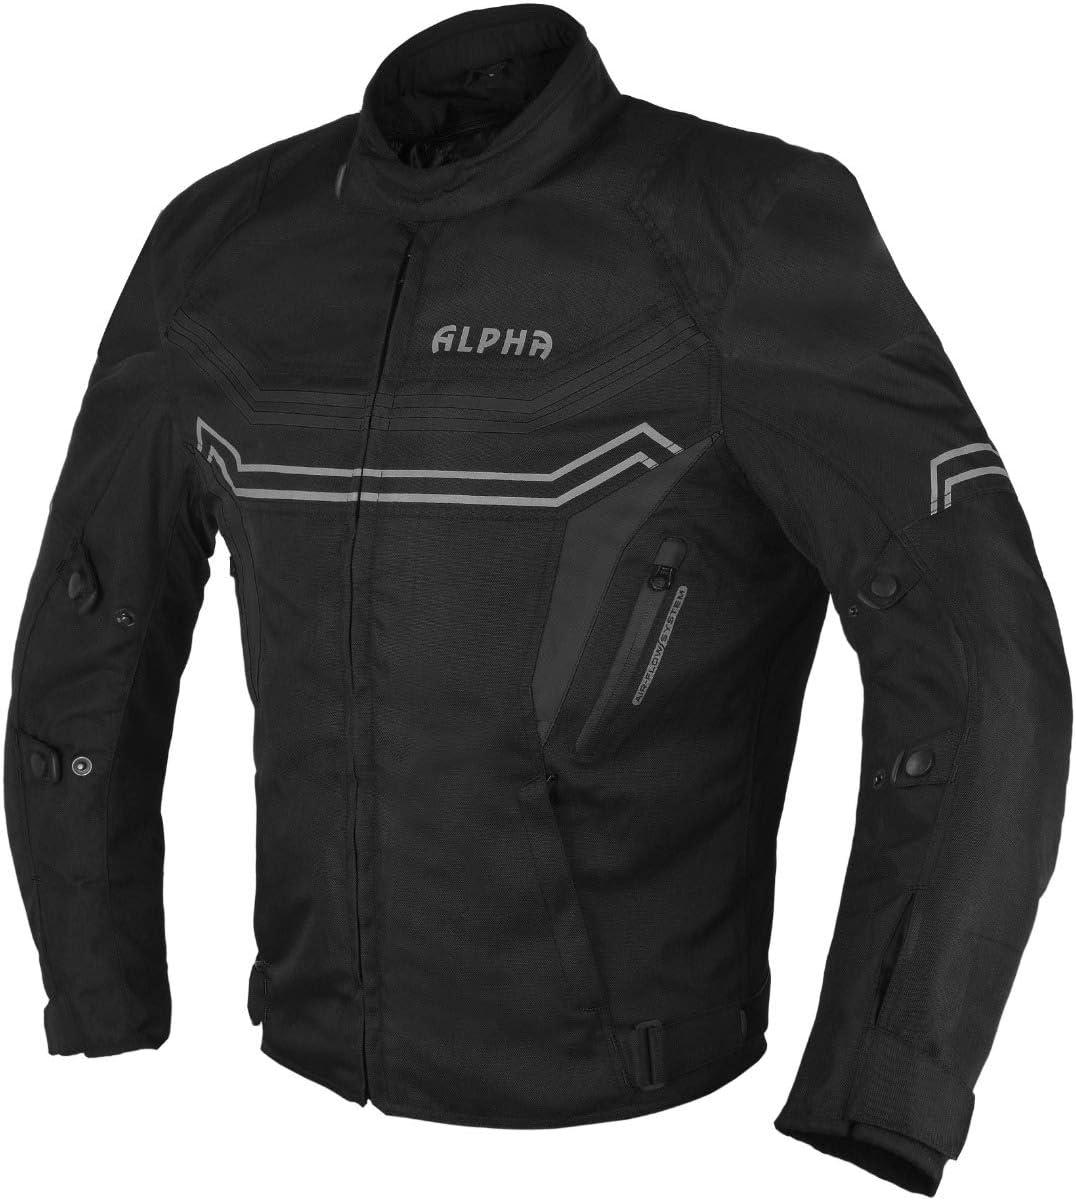 ORANGE, XX-LARGE JAYEFO-ALPHA CYCLE GEAR MOTORCYCLE ALL SEASON JACKET